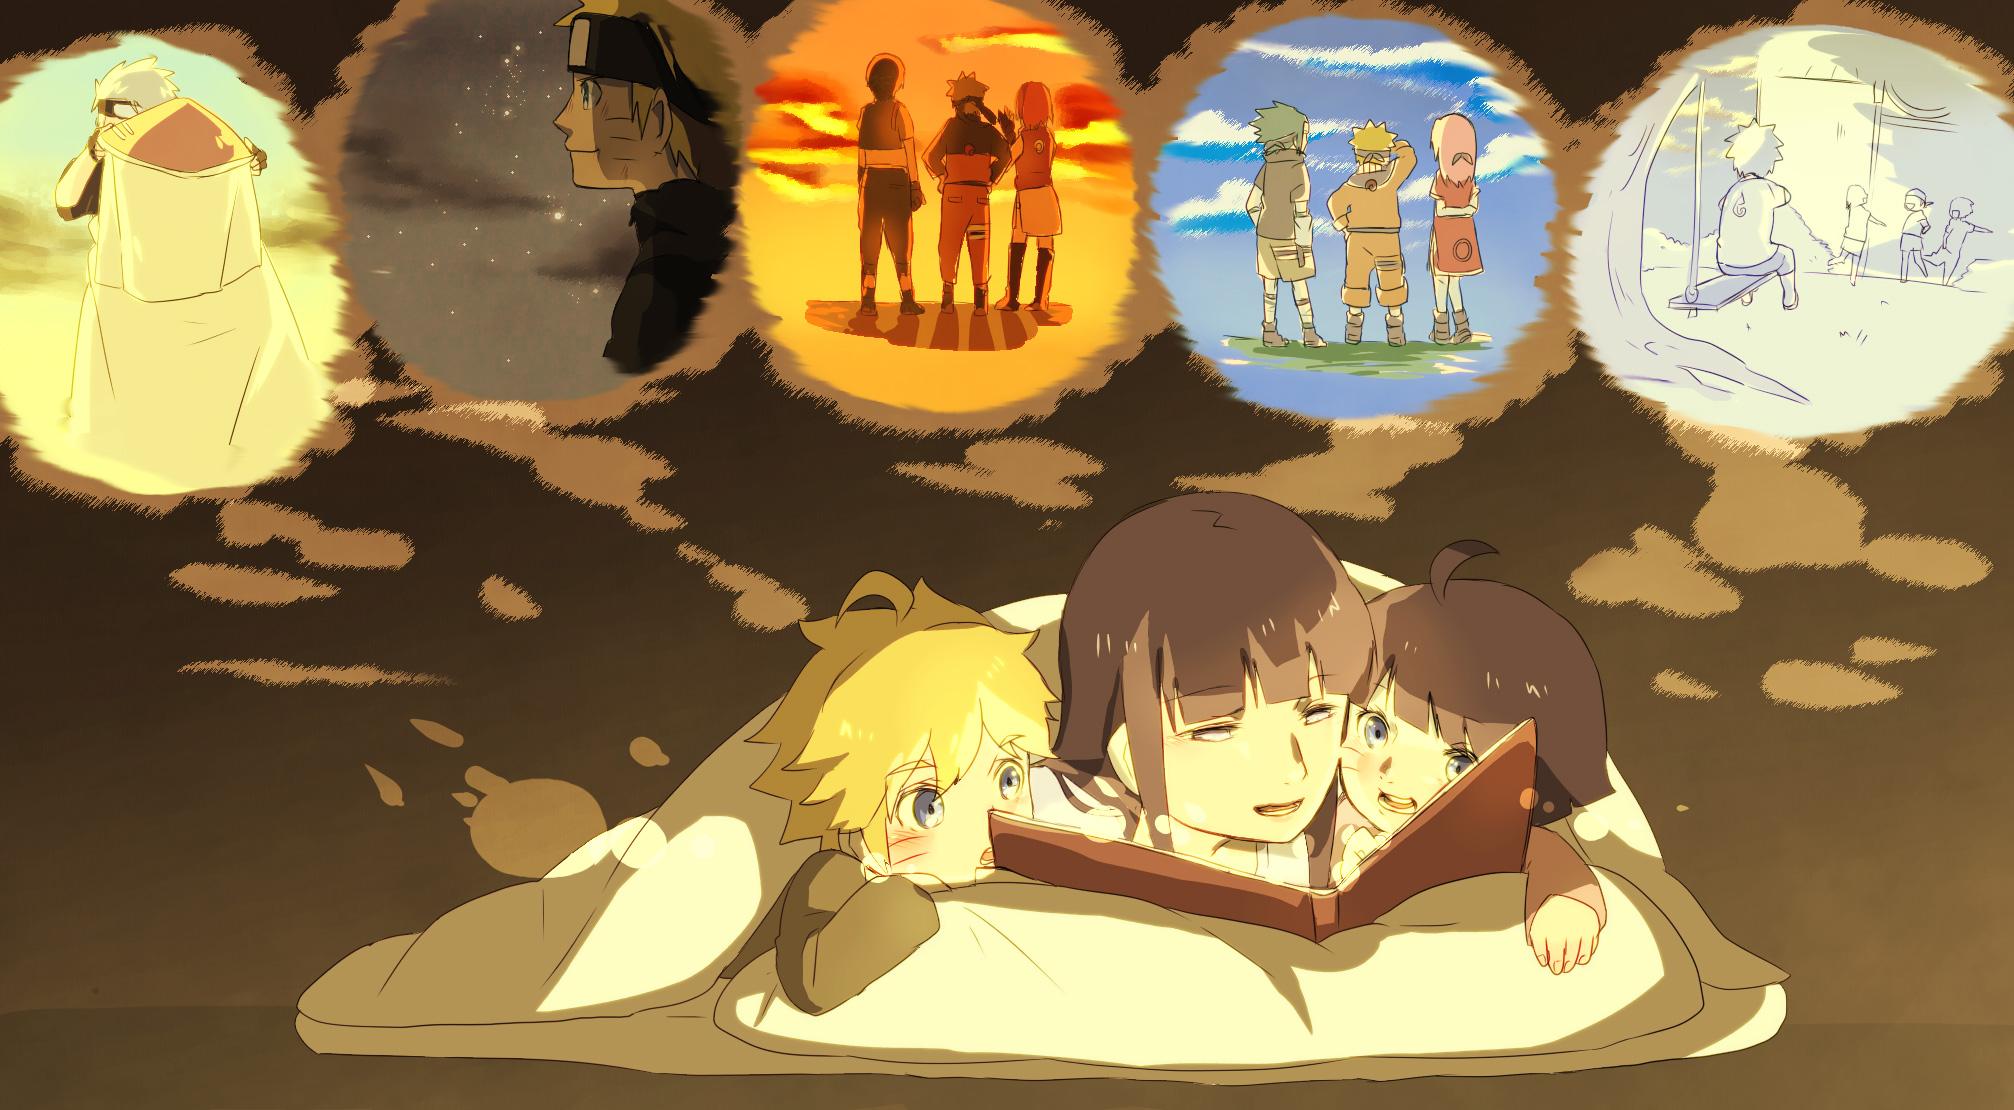 Top-Ten-Pixiv-Artworks-of-the-Week-#2-Naruto-Edition_Haruhichan.com_#1_ある英雄の物語_みずと▼